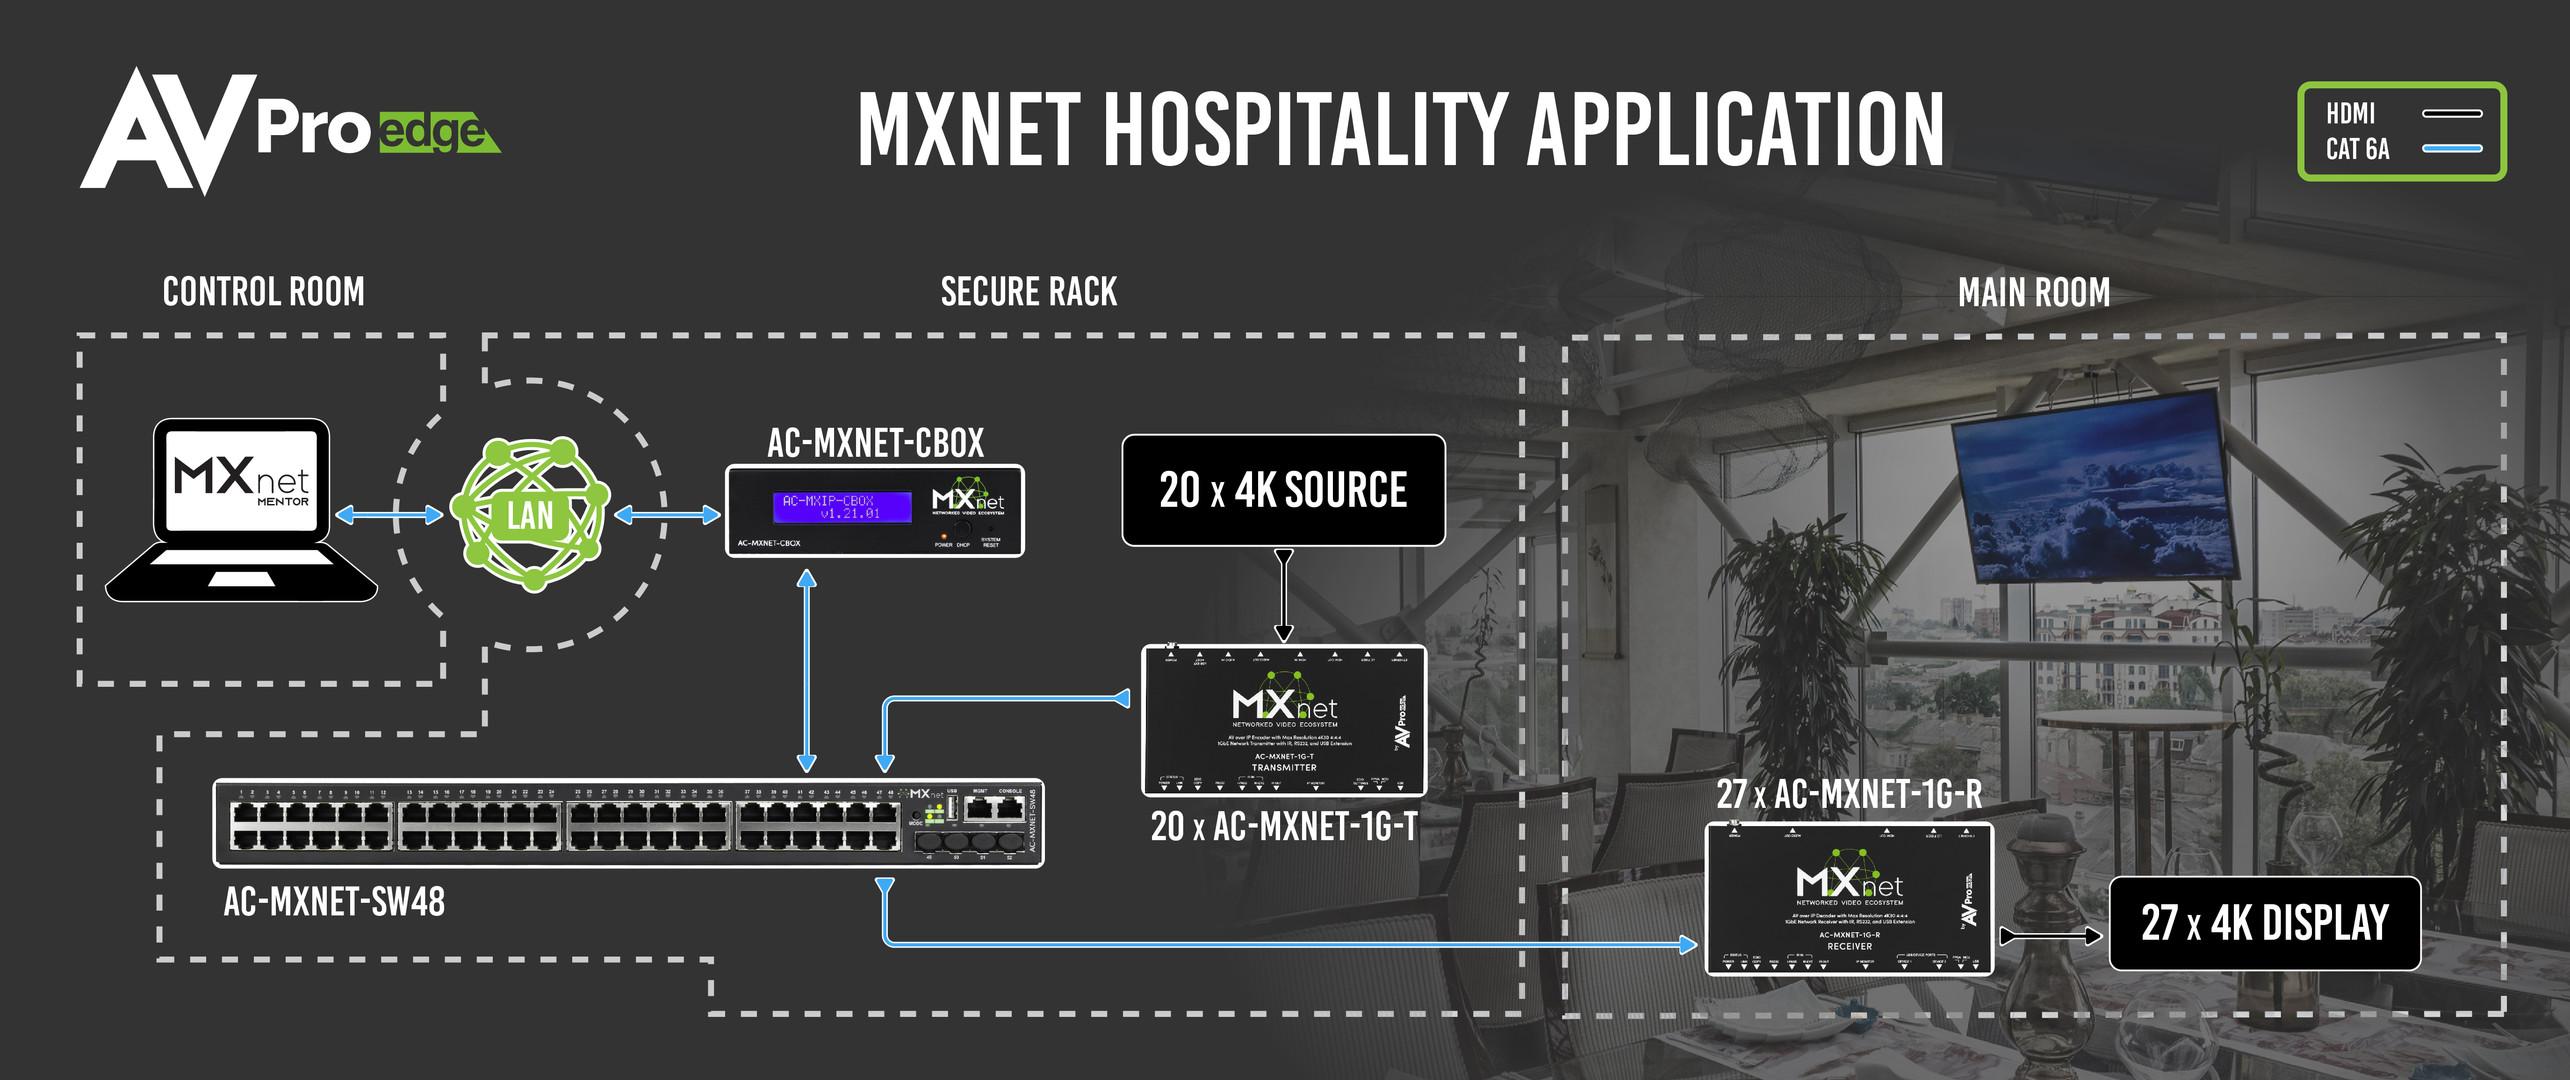 MX Net Hospitality Application-01.jpg